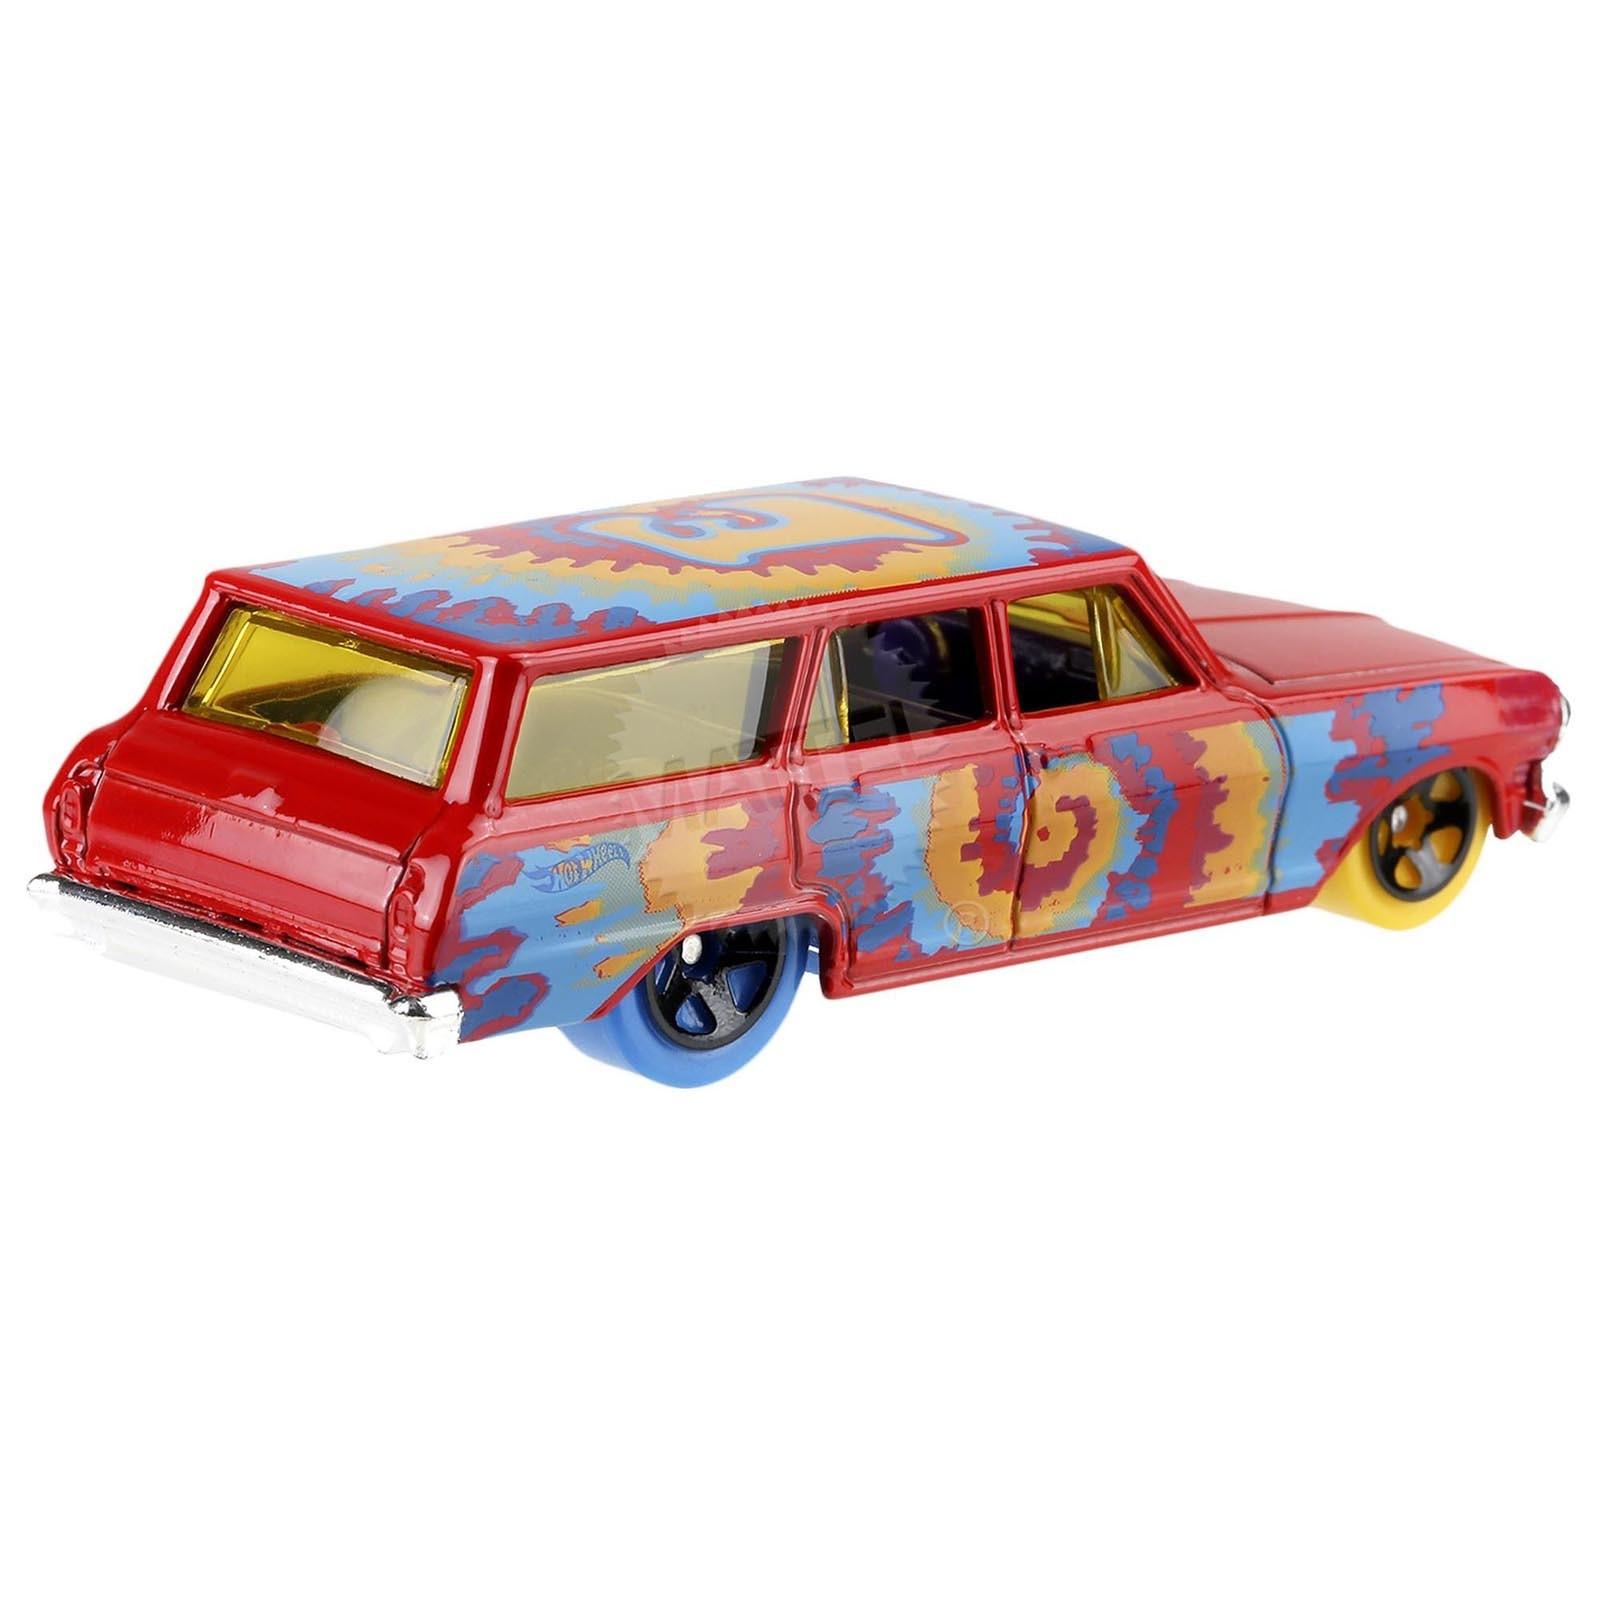 Hot Wheels - '64 Chevy Nova Wagon - FYF21